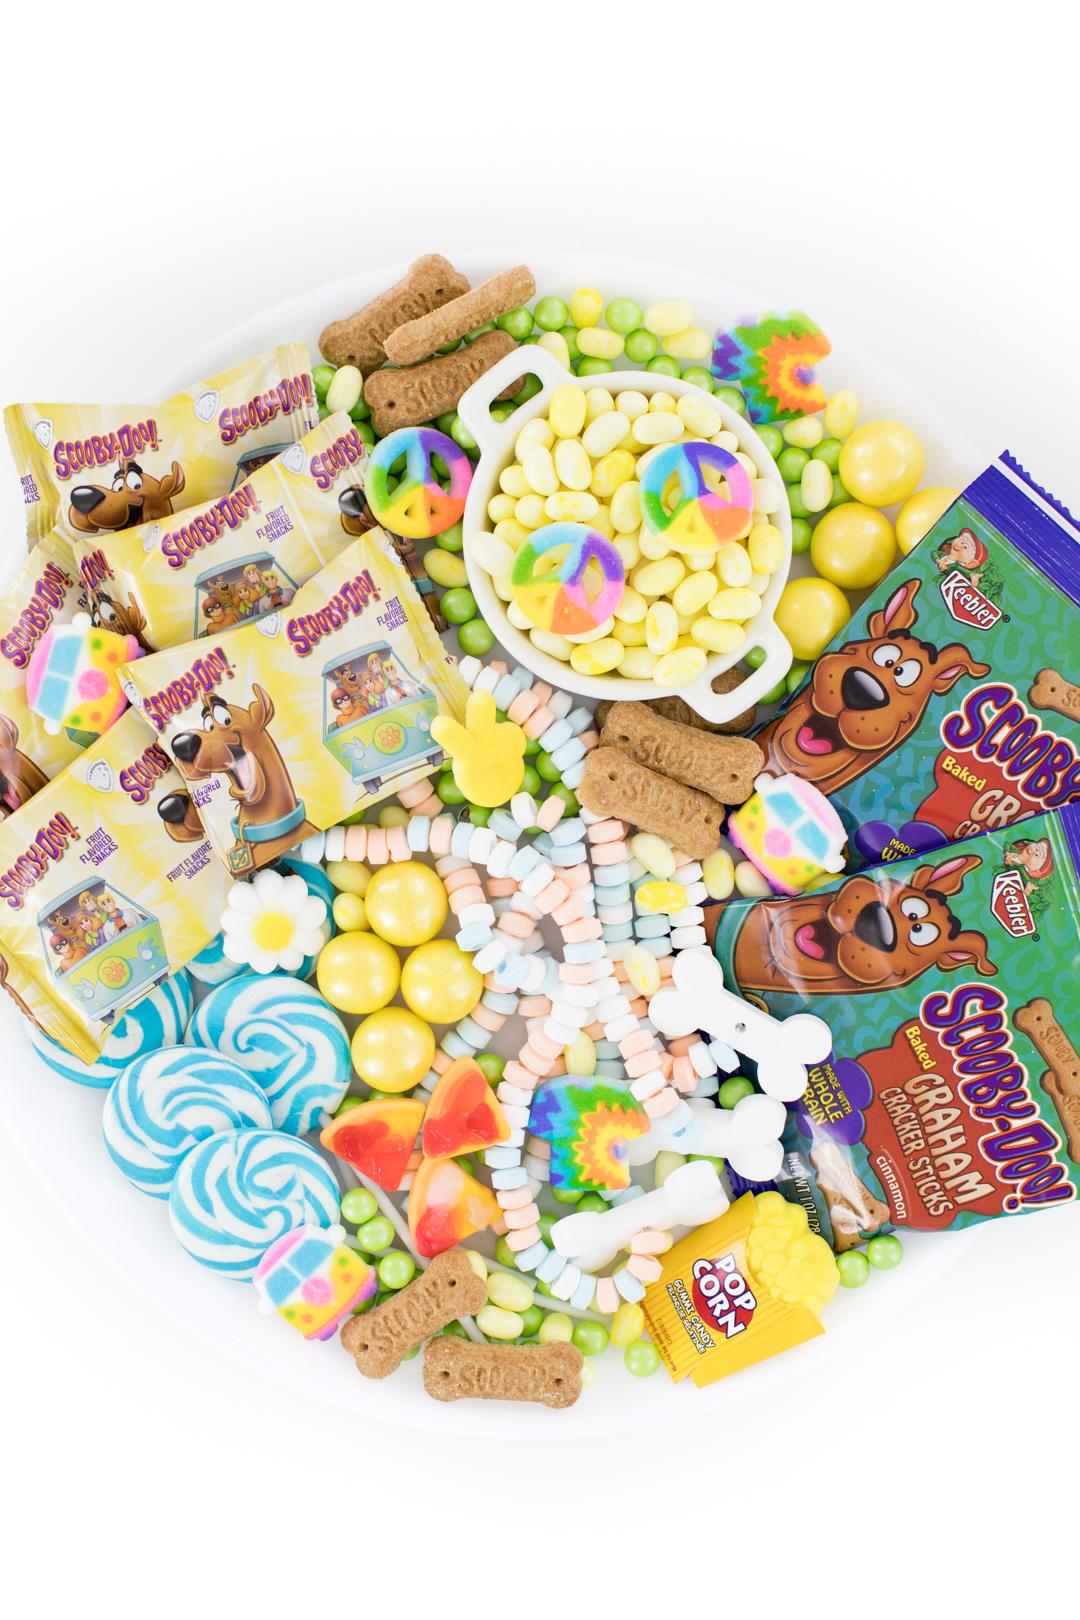 scoob! movie snack tray